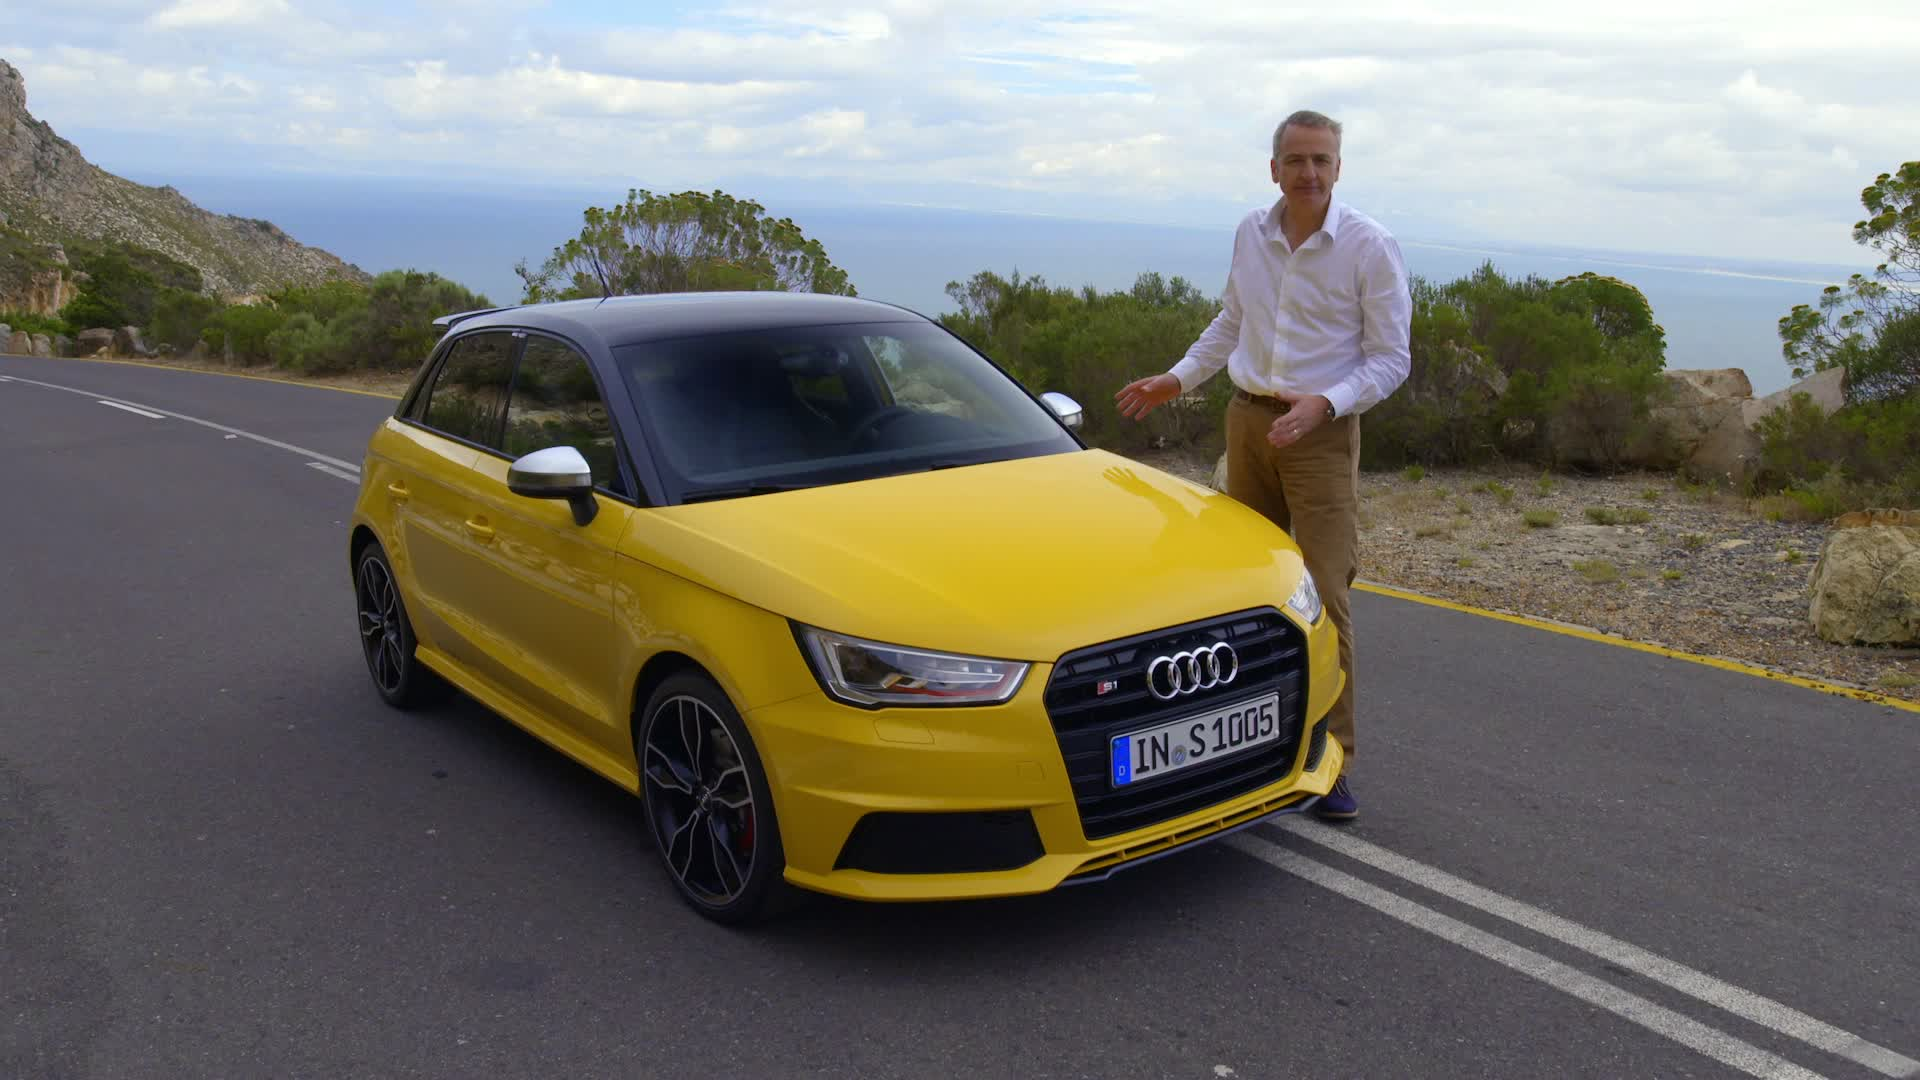 Audi S1 Sportback - World premiere 2014